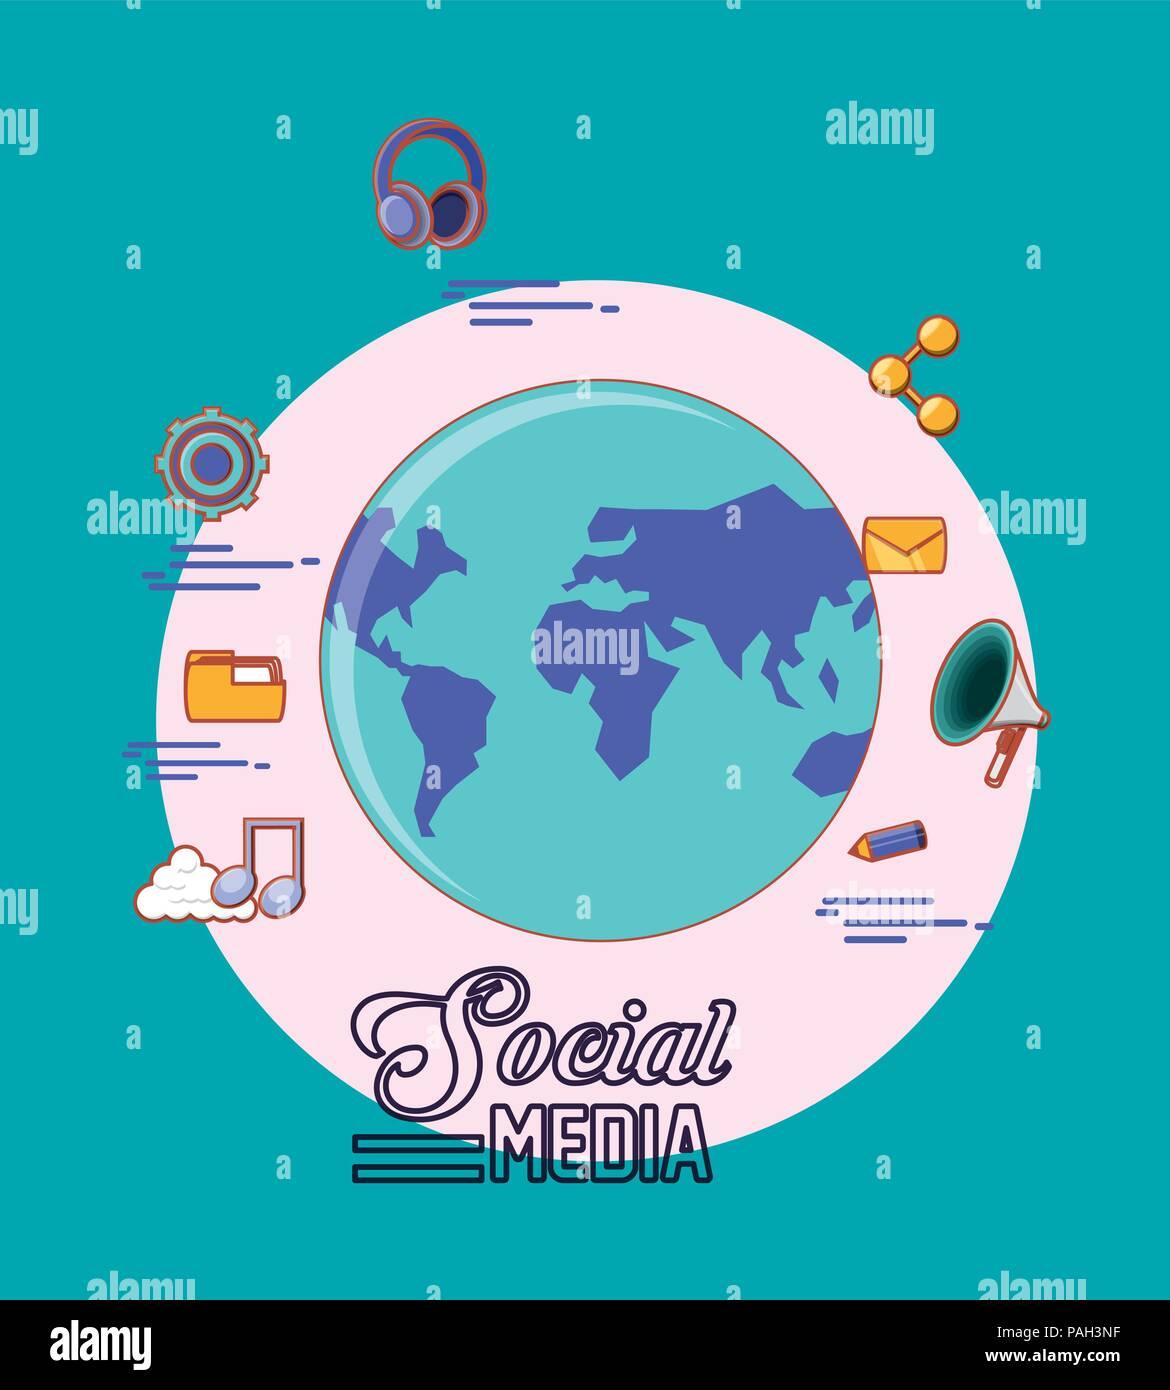 world planet globalization social media icons vector illustration - Stock Image